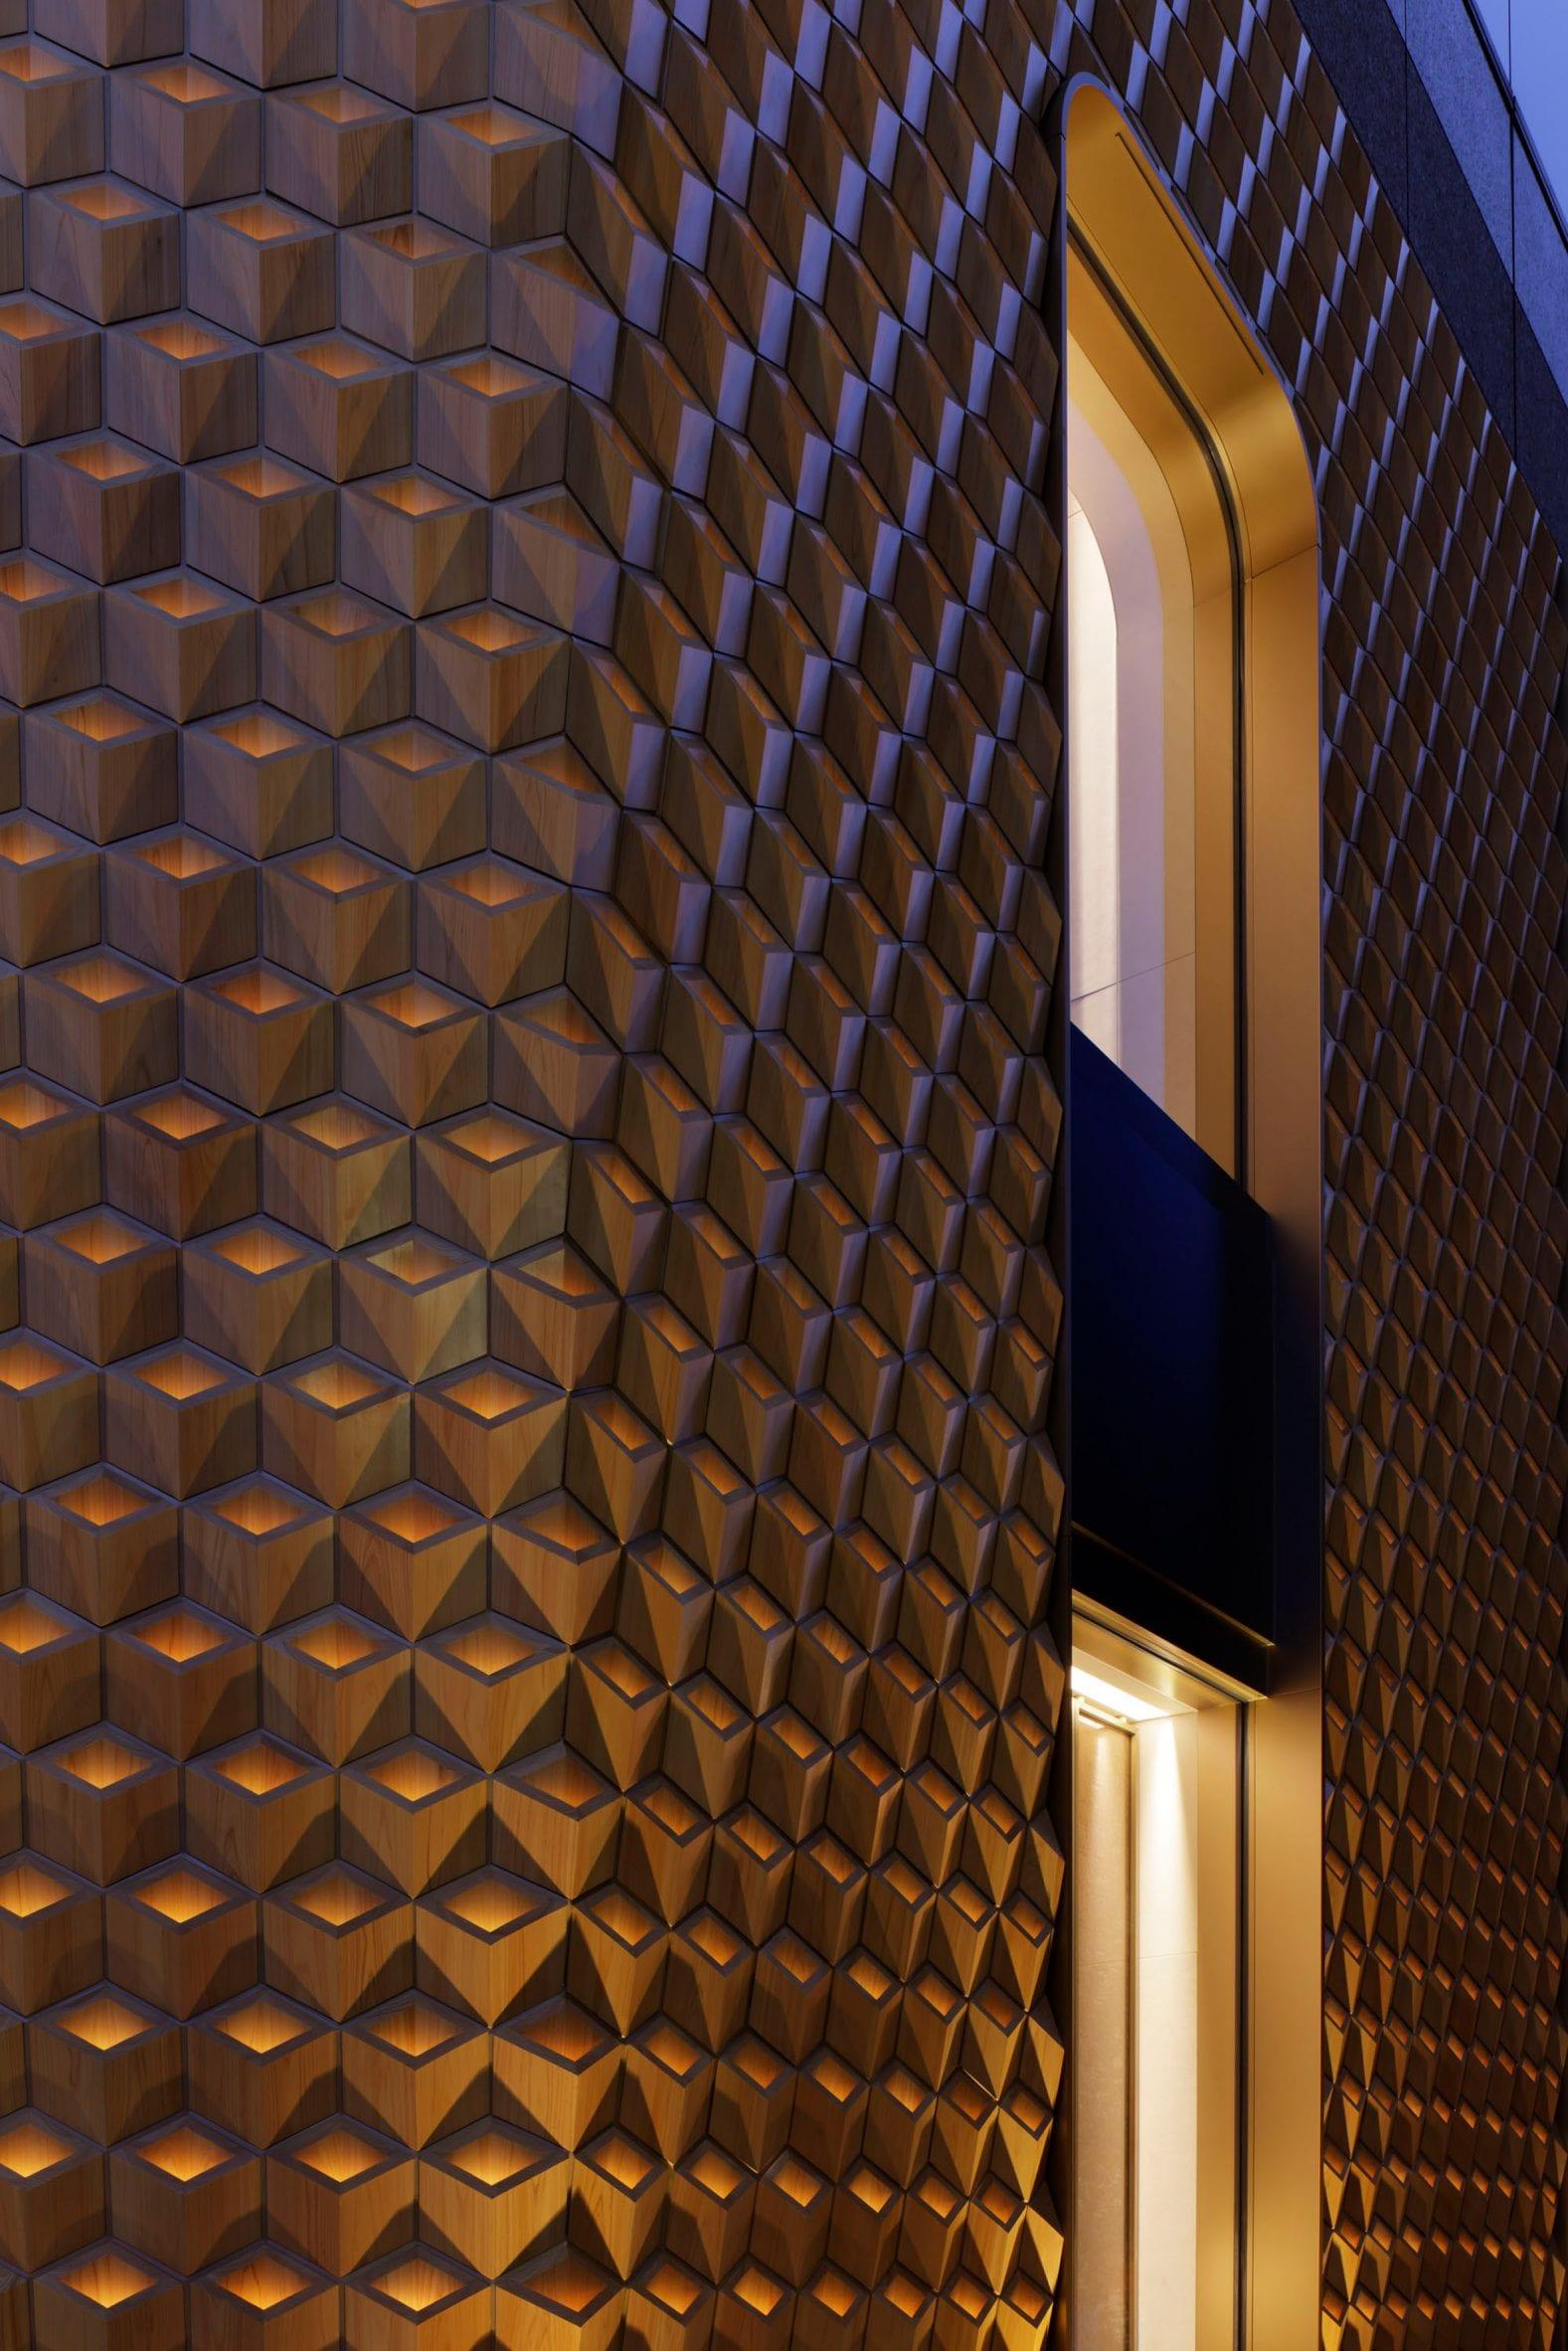 The wooden by Klein Dytham Architecture illuminate